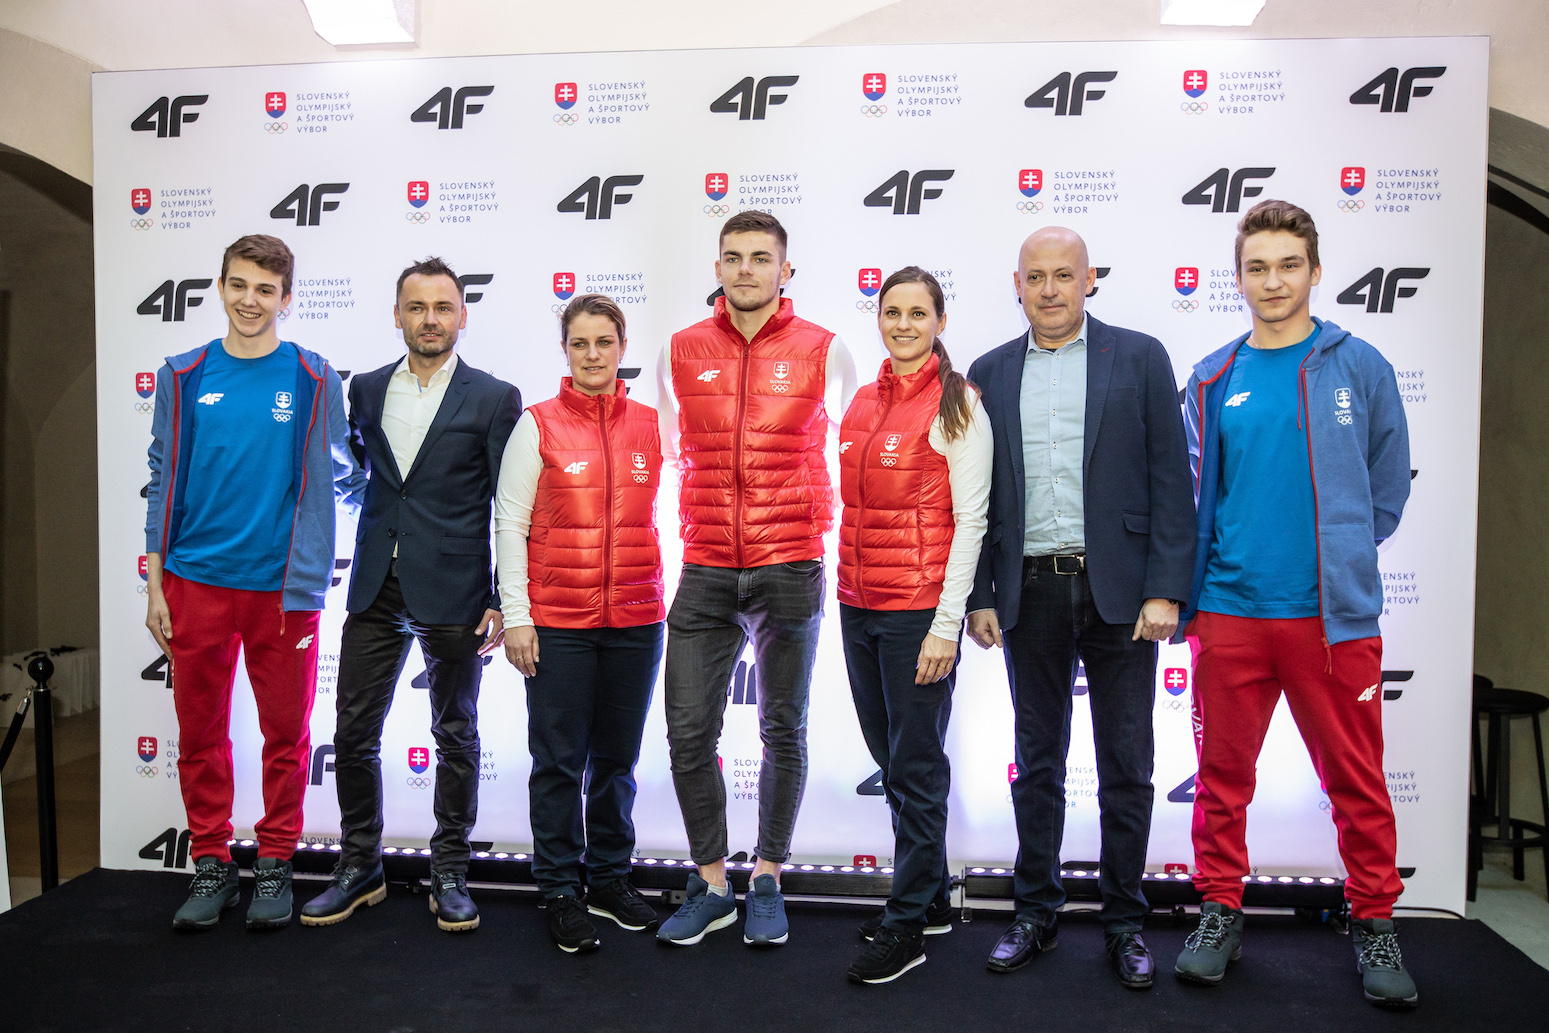 Fotografie športovcov a značky 4F